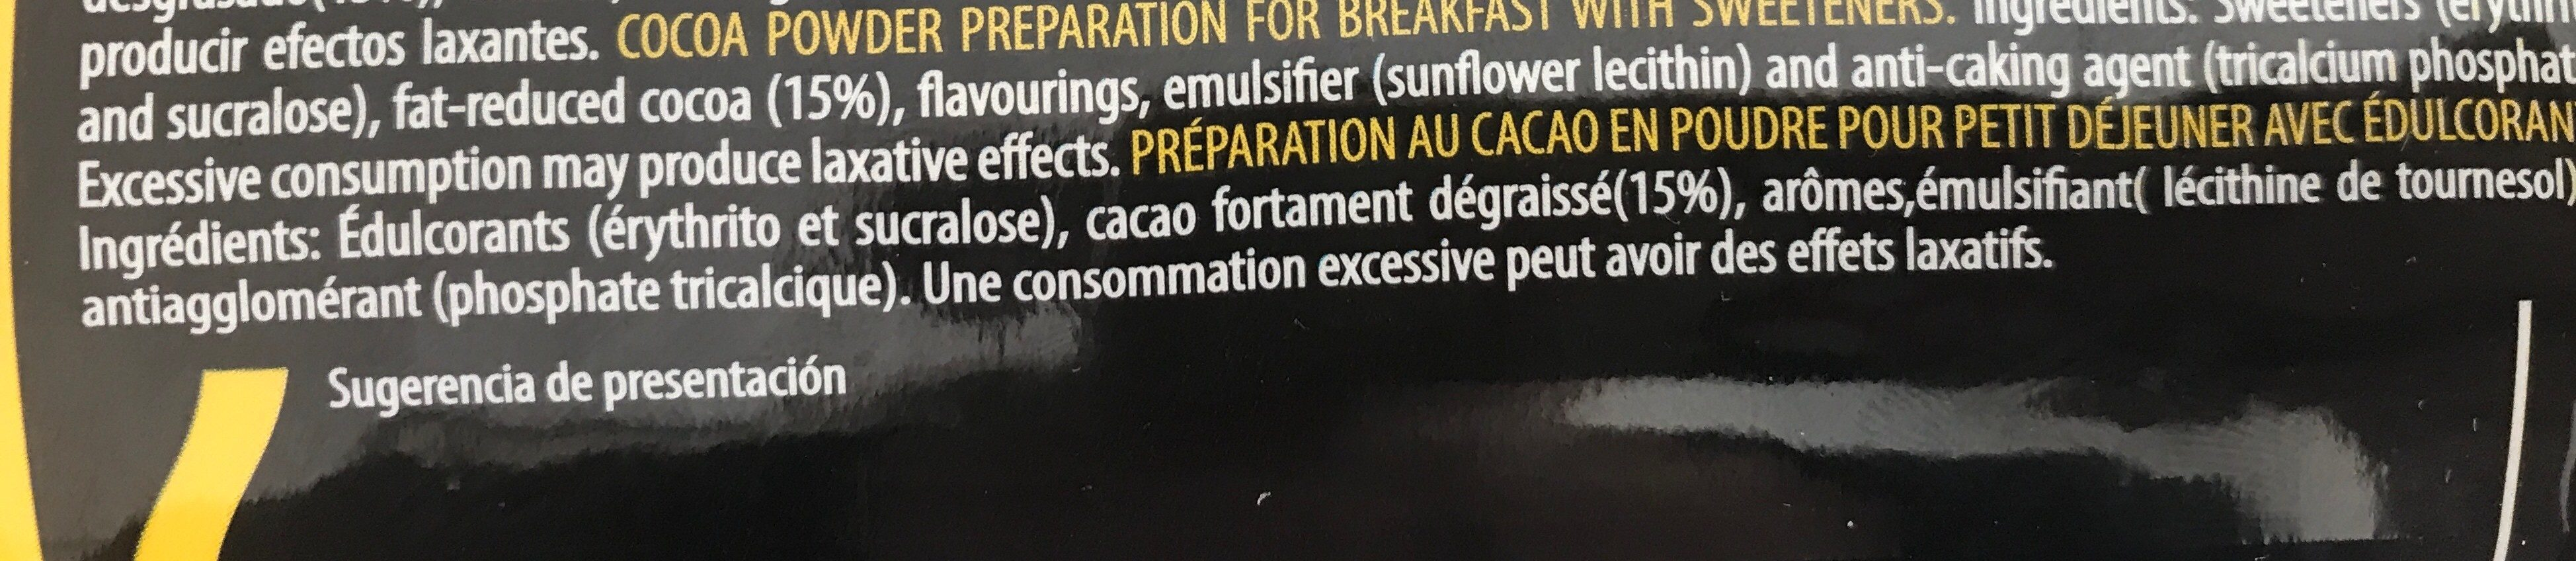 Cocoa powder - Ingredients - fr